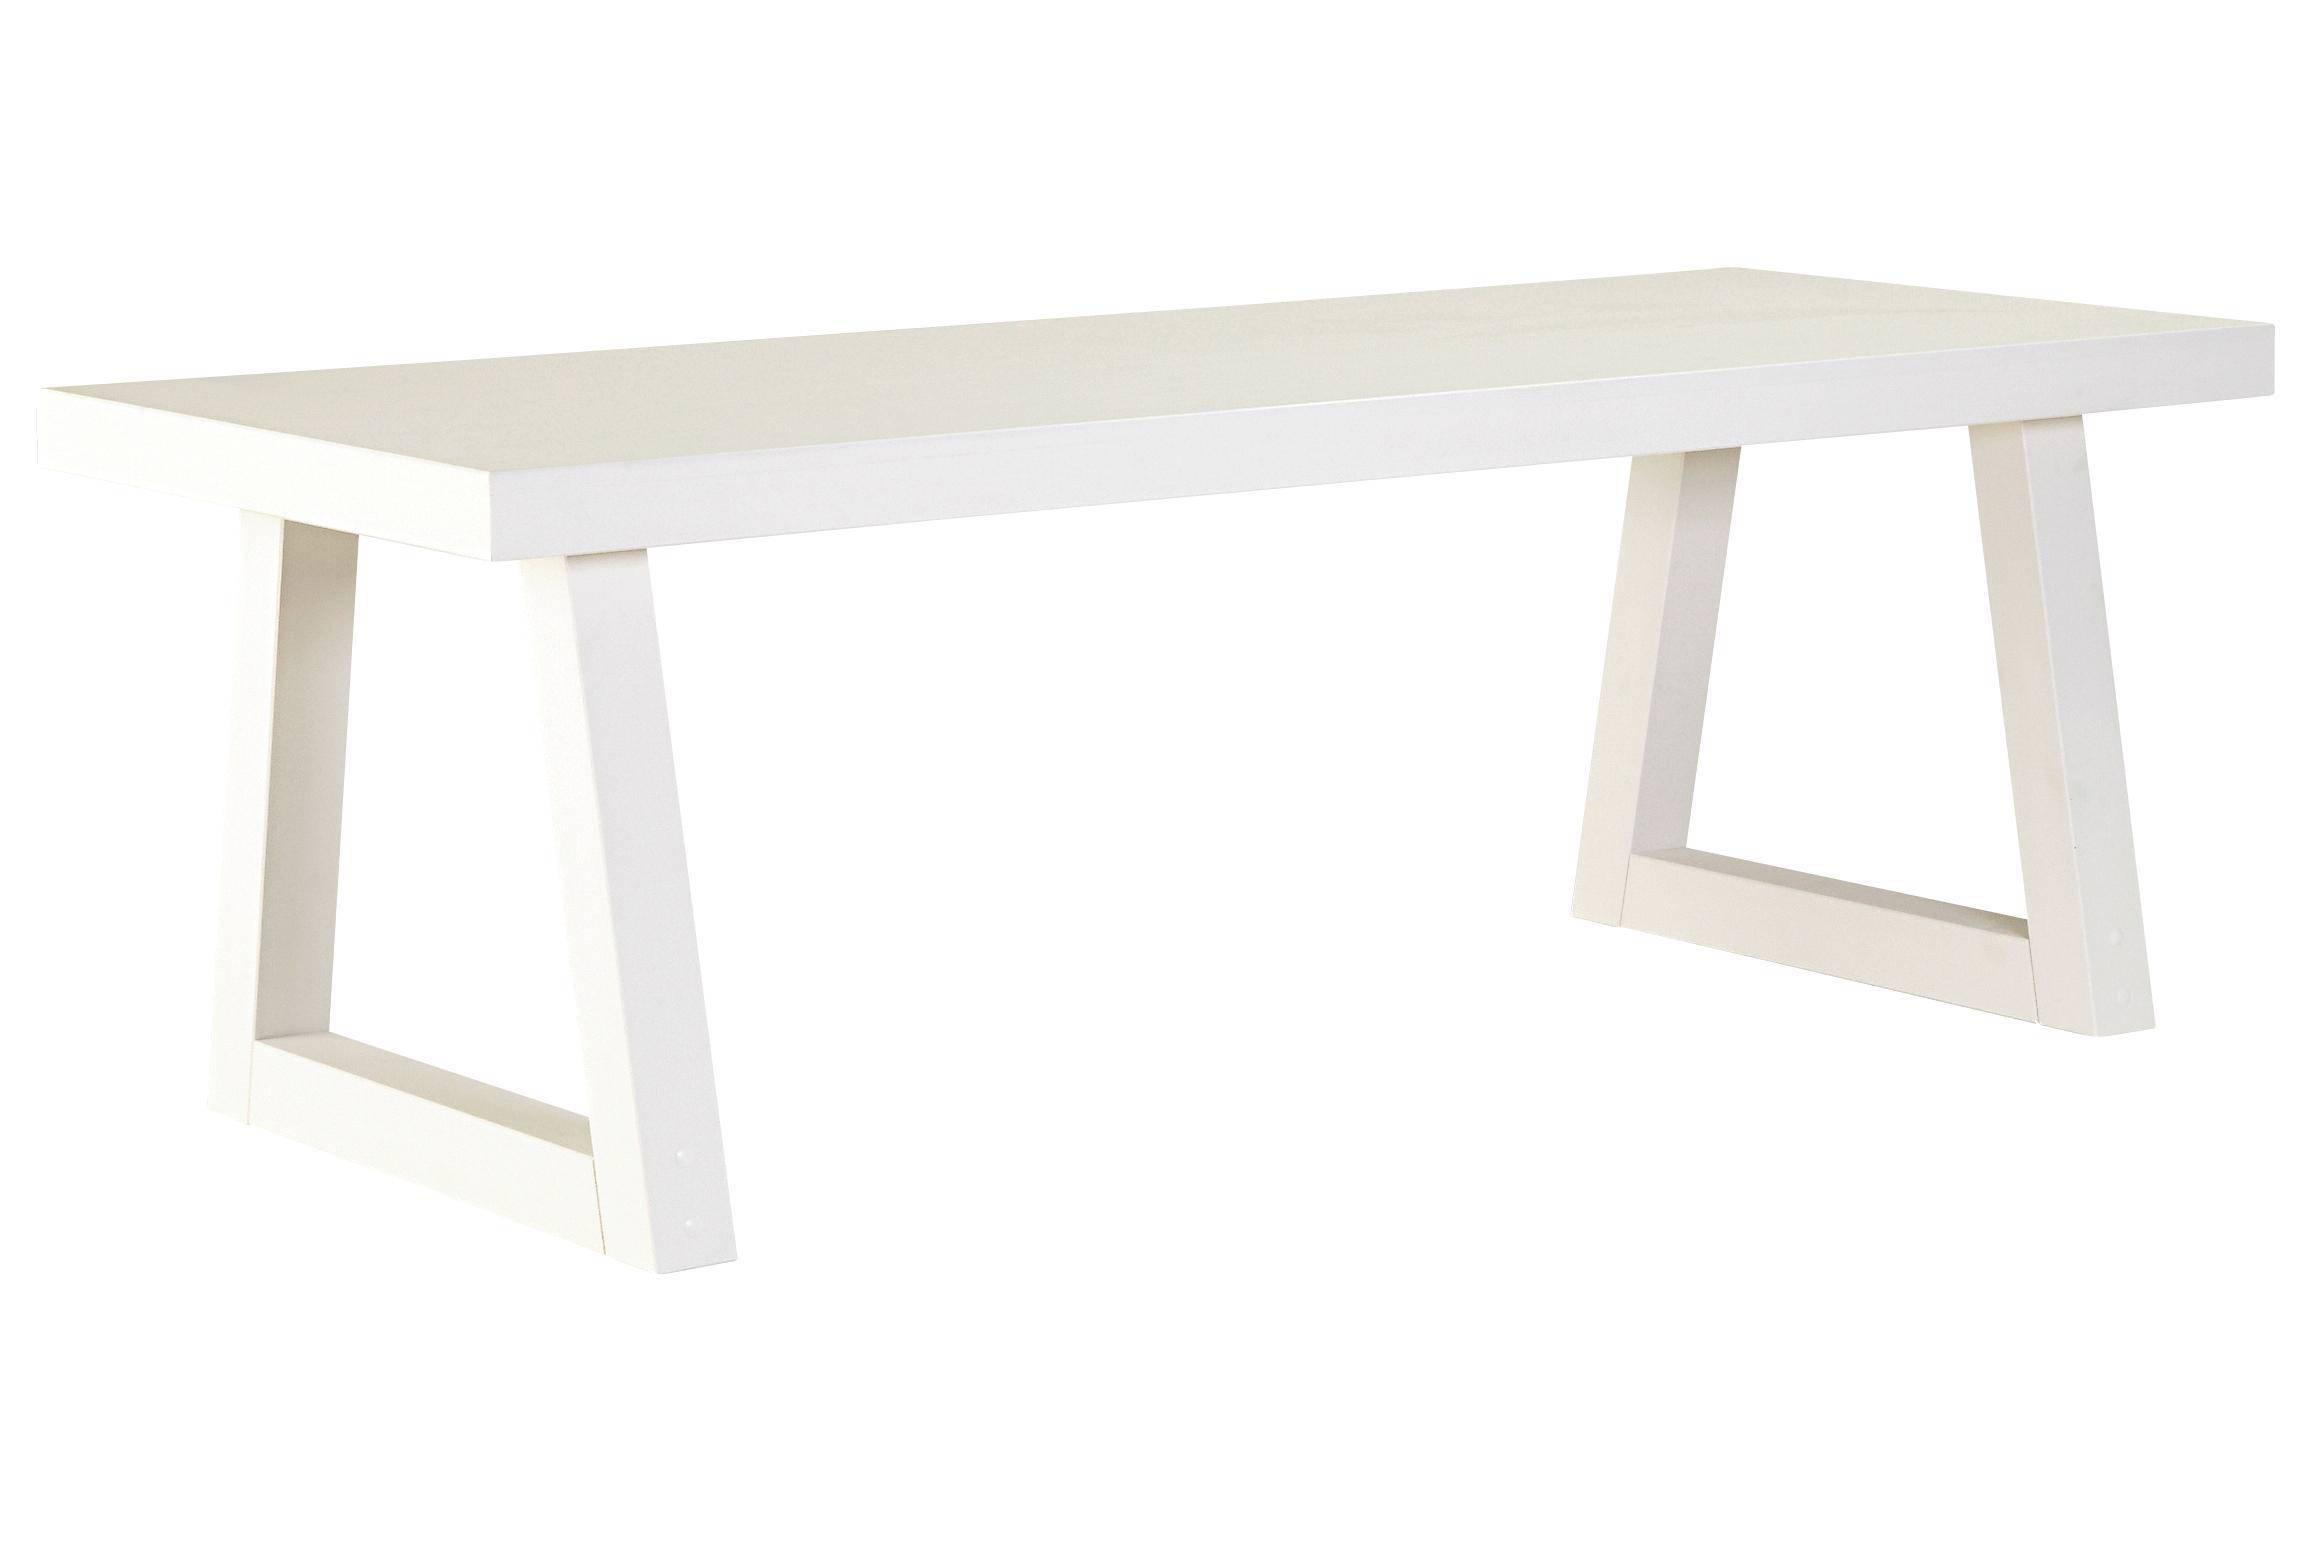 Witte Eettafel 220 Cm.Whkmp S Own Eettafel Kristian 220 Cm Wehkamp